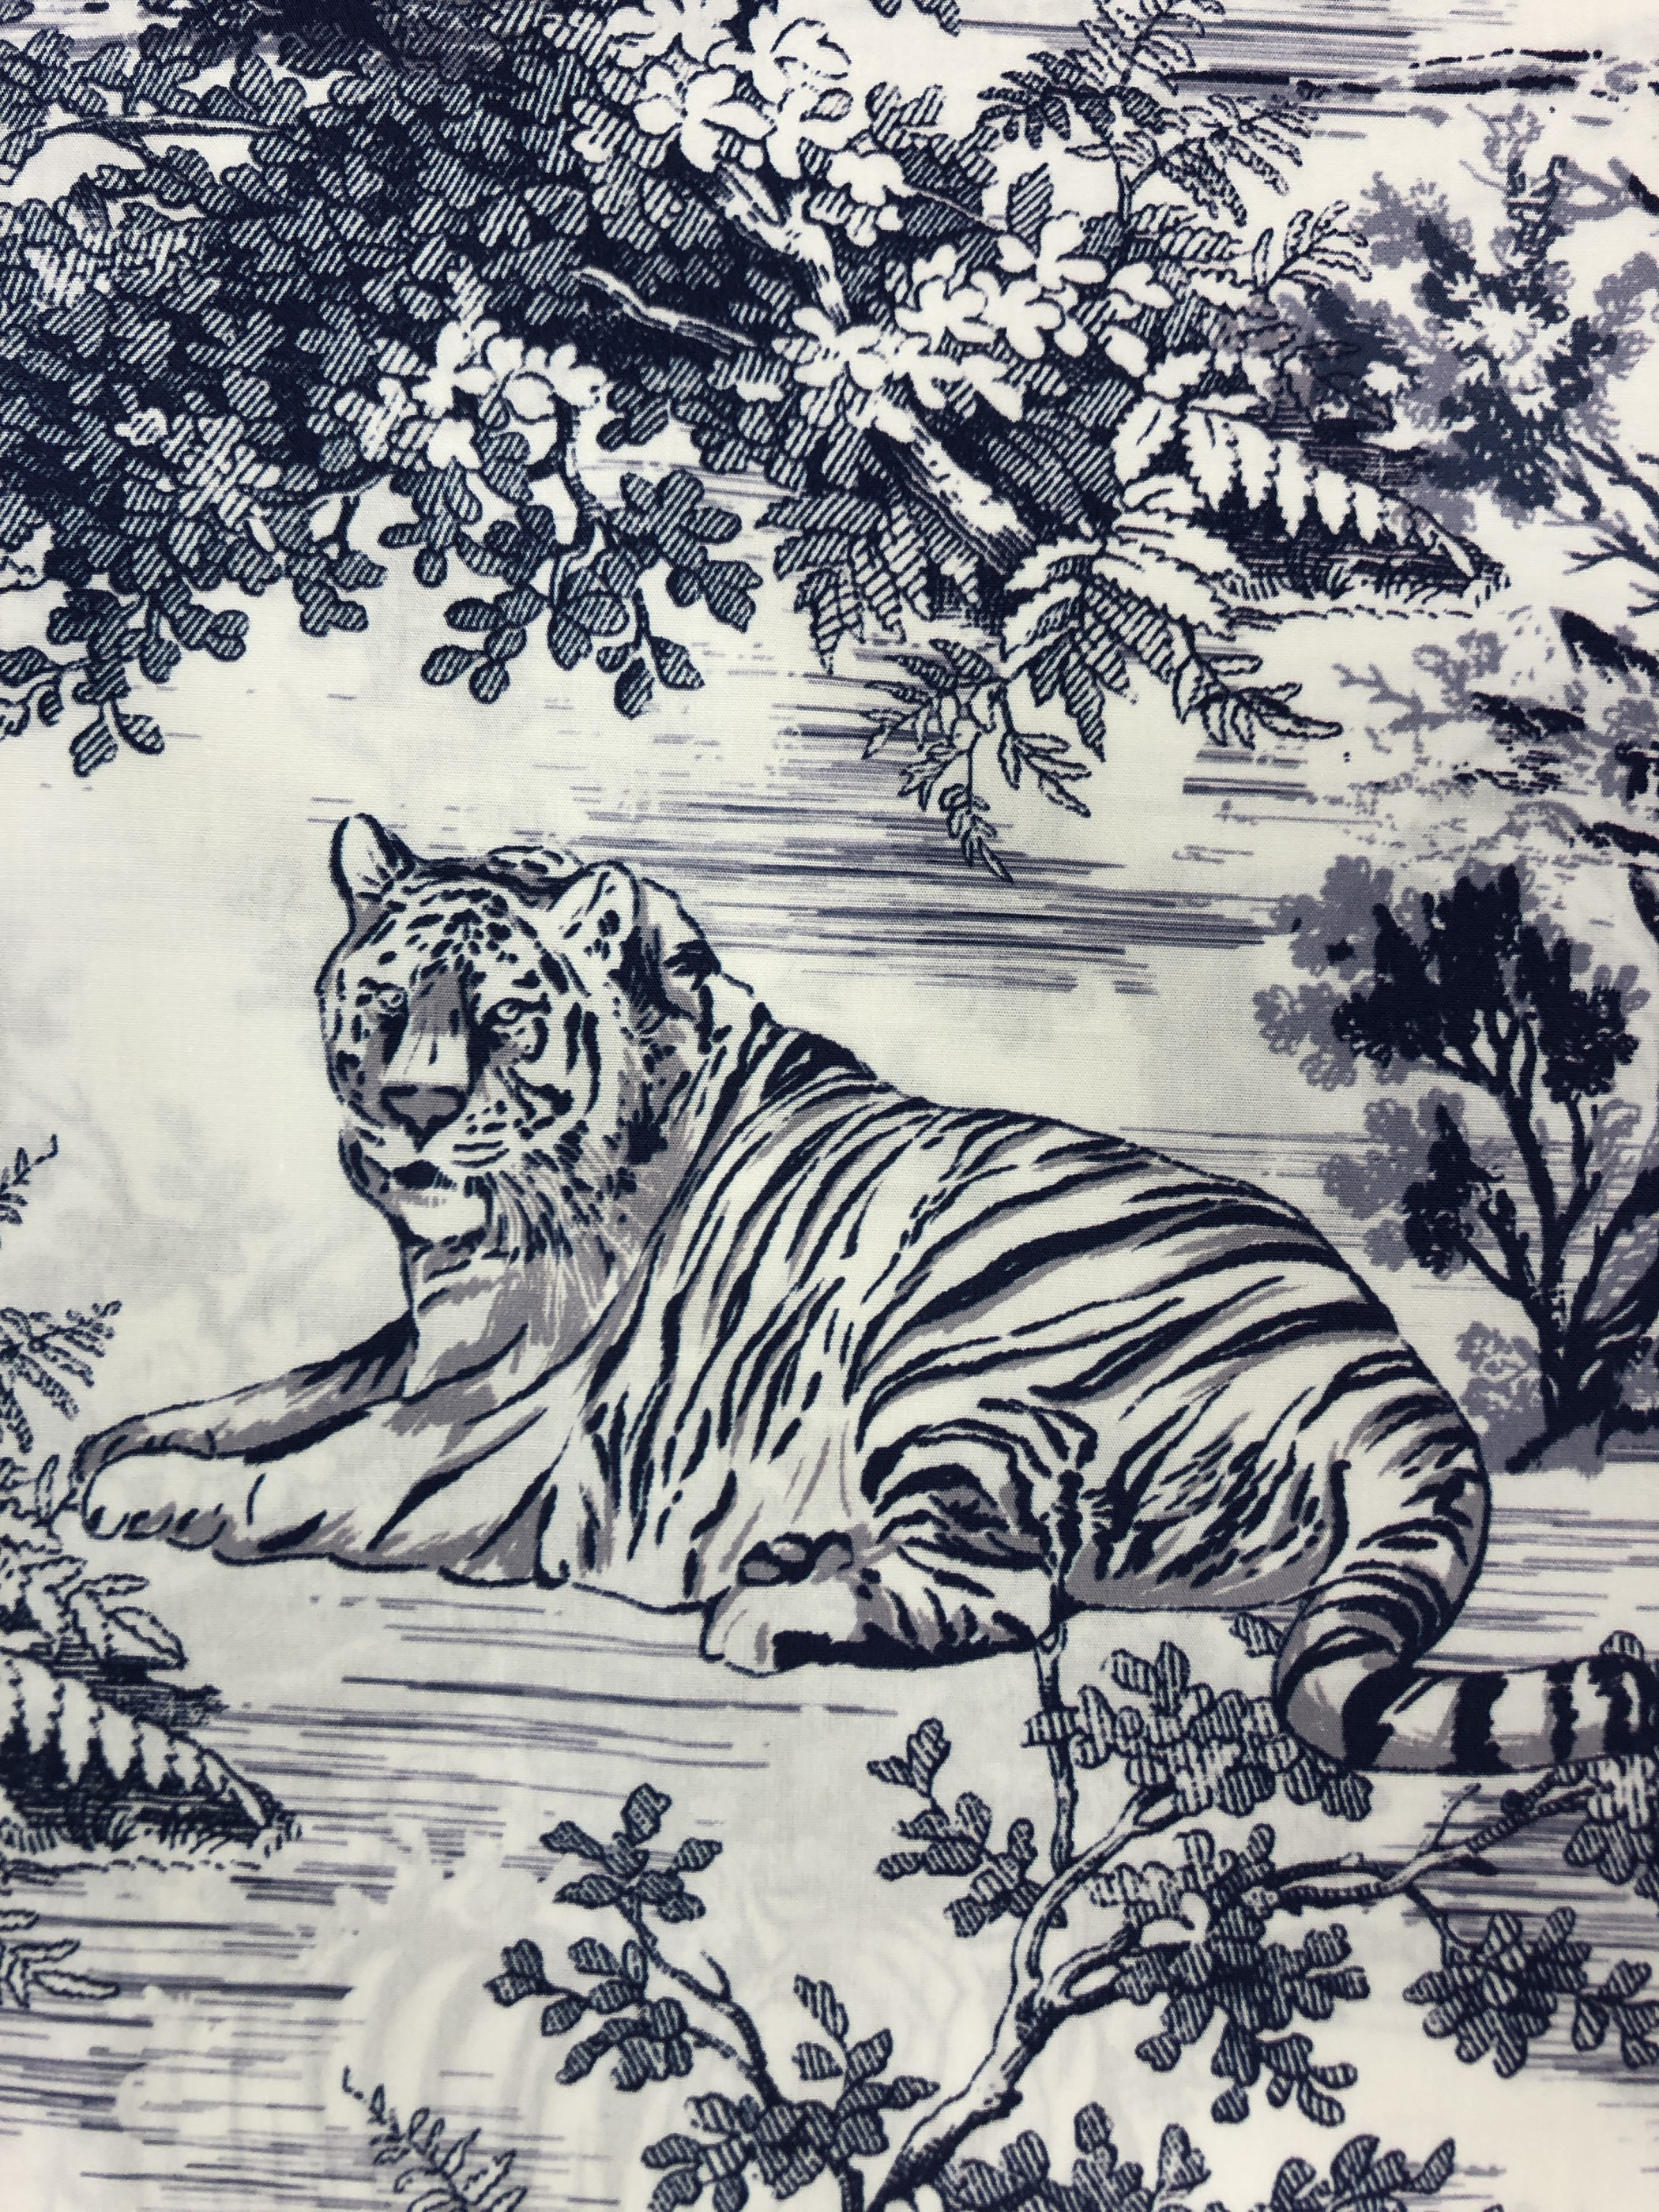 porslinstuger tiger vit blått modetyg metervara bomull tyglust laholm